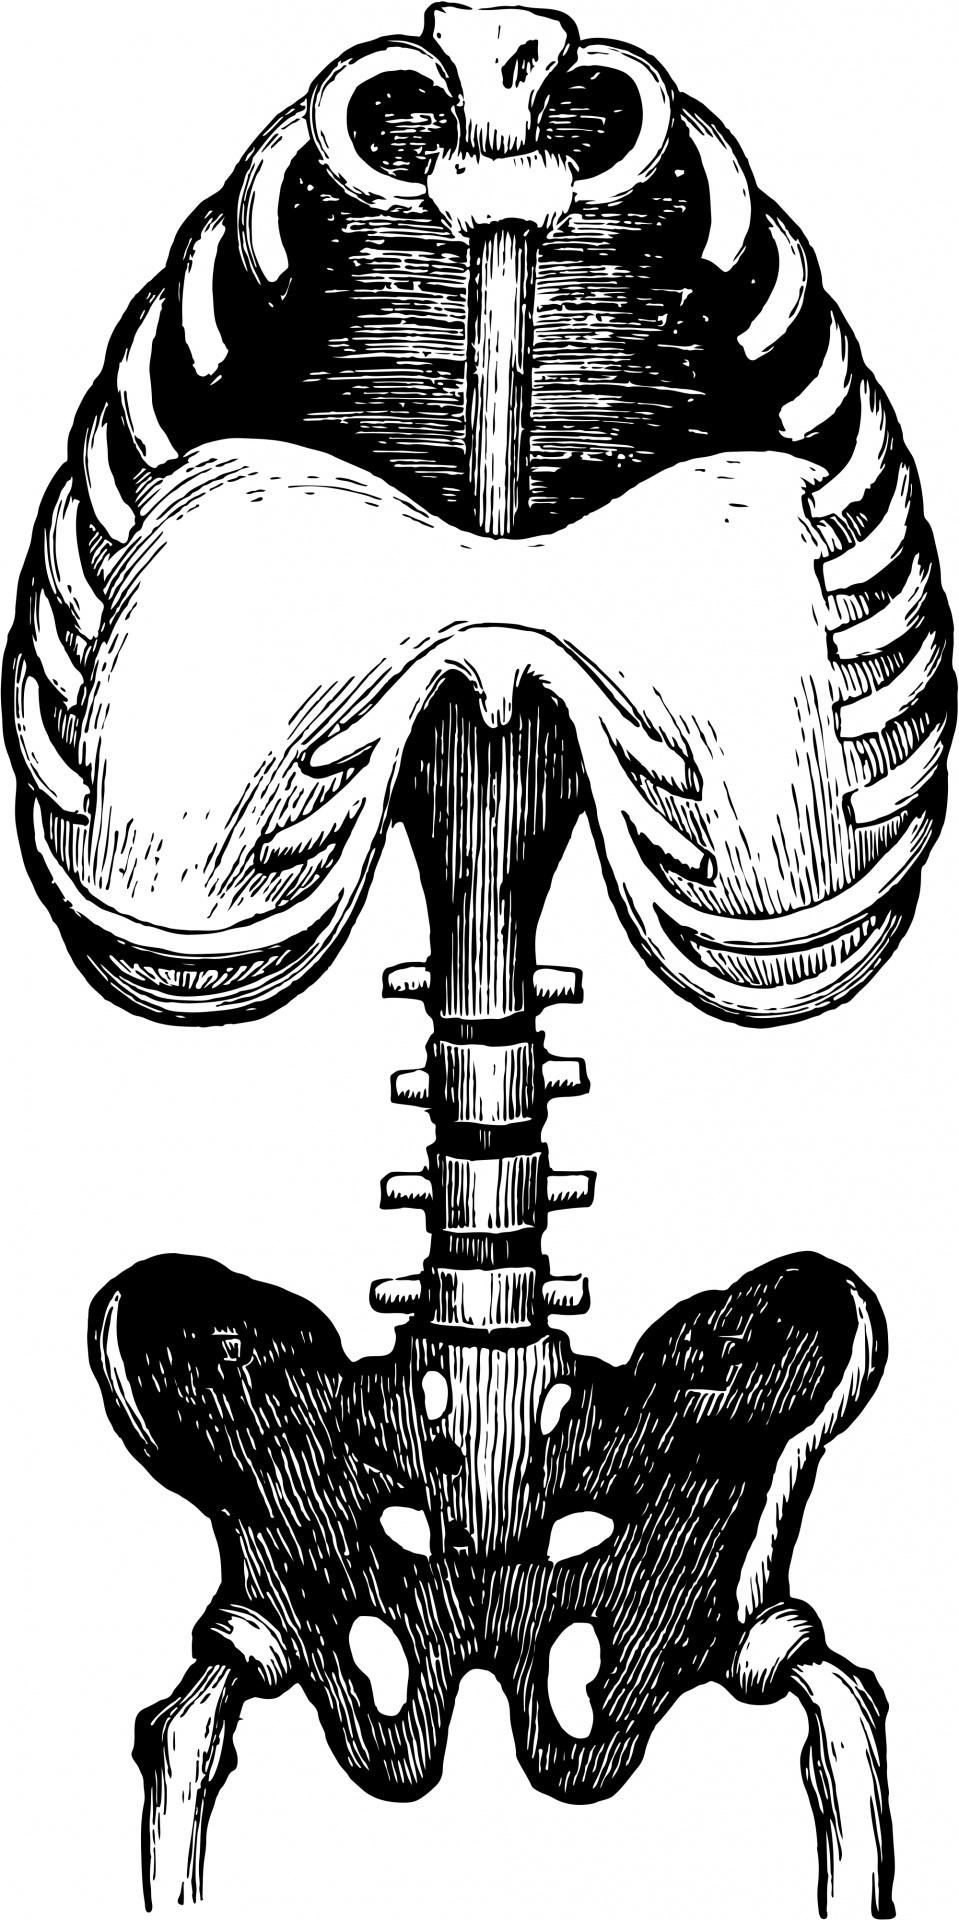 959x1920 Human Anatomy Public Domain Clipart